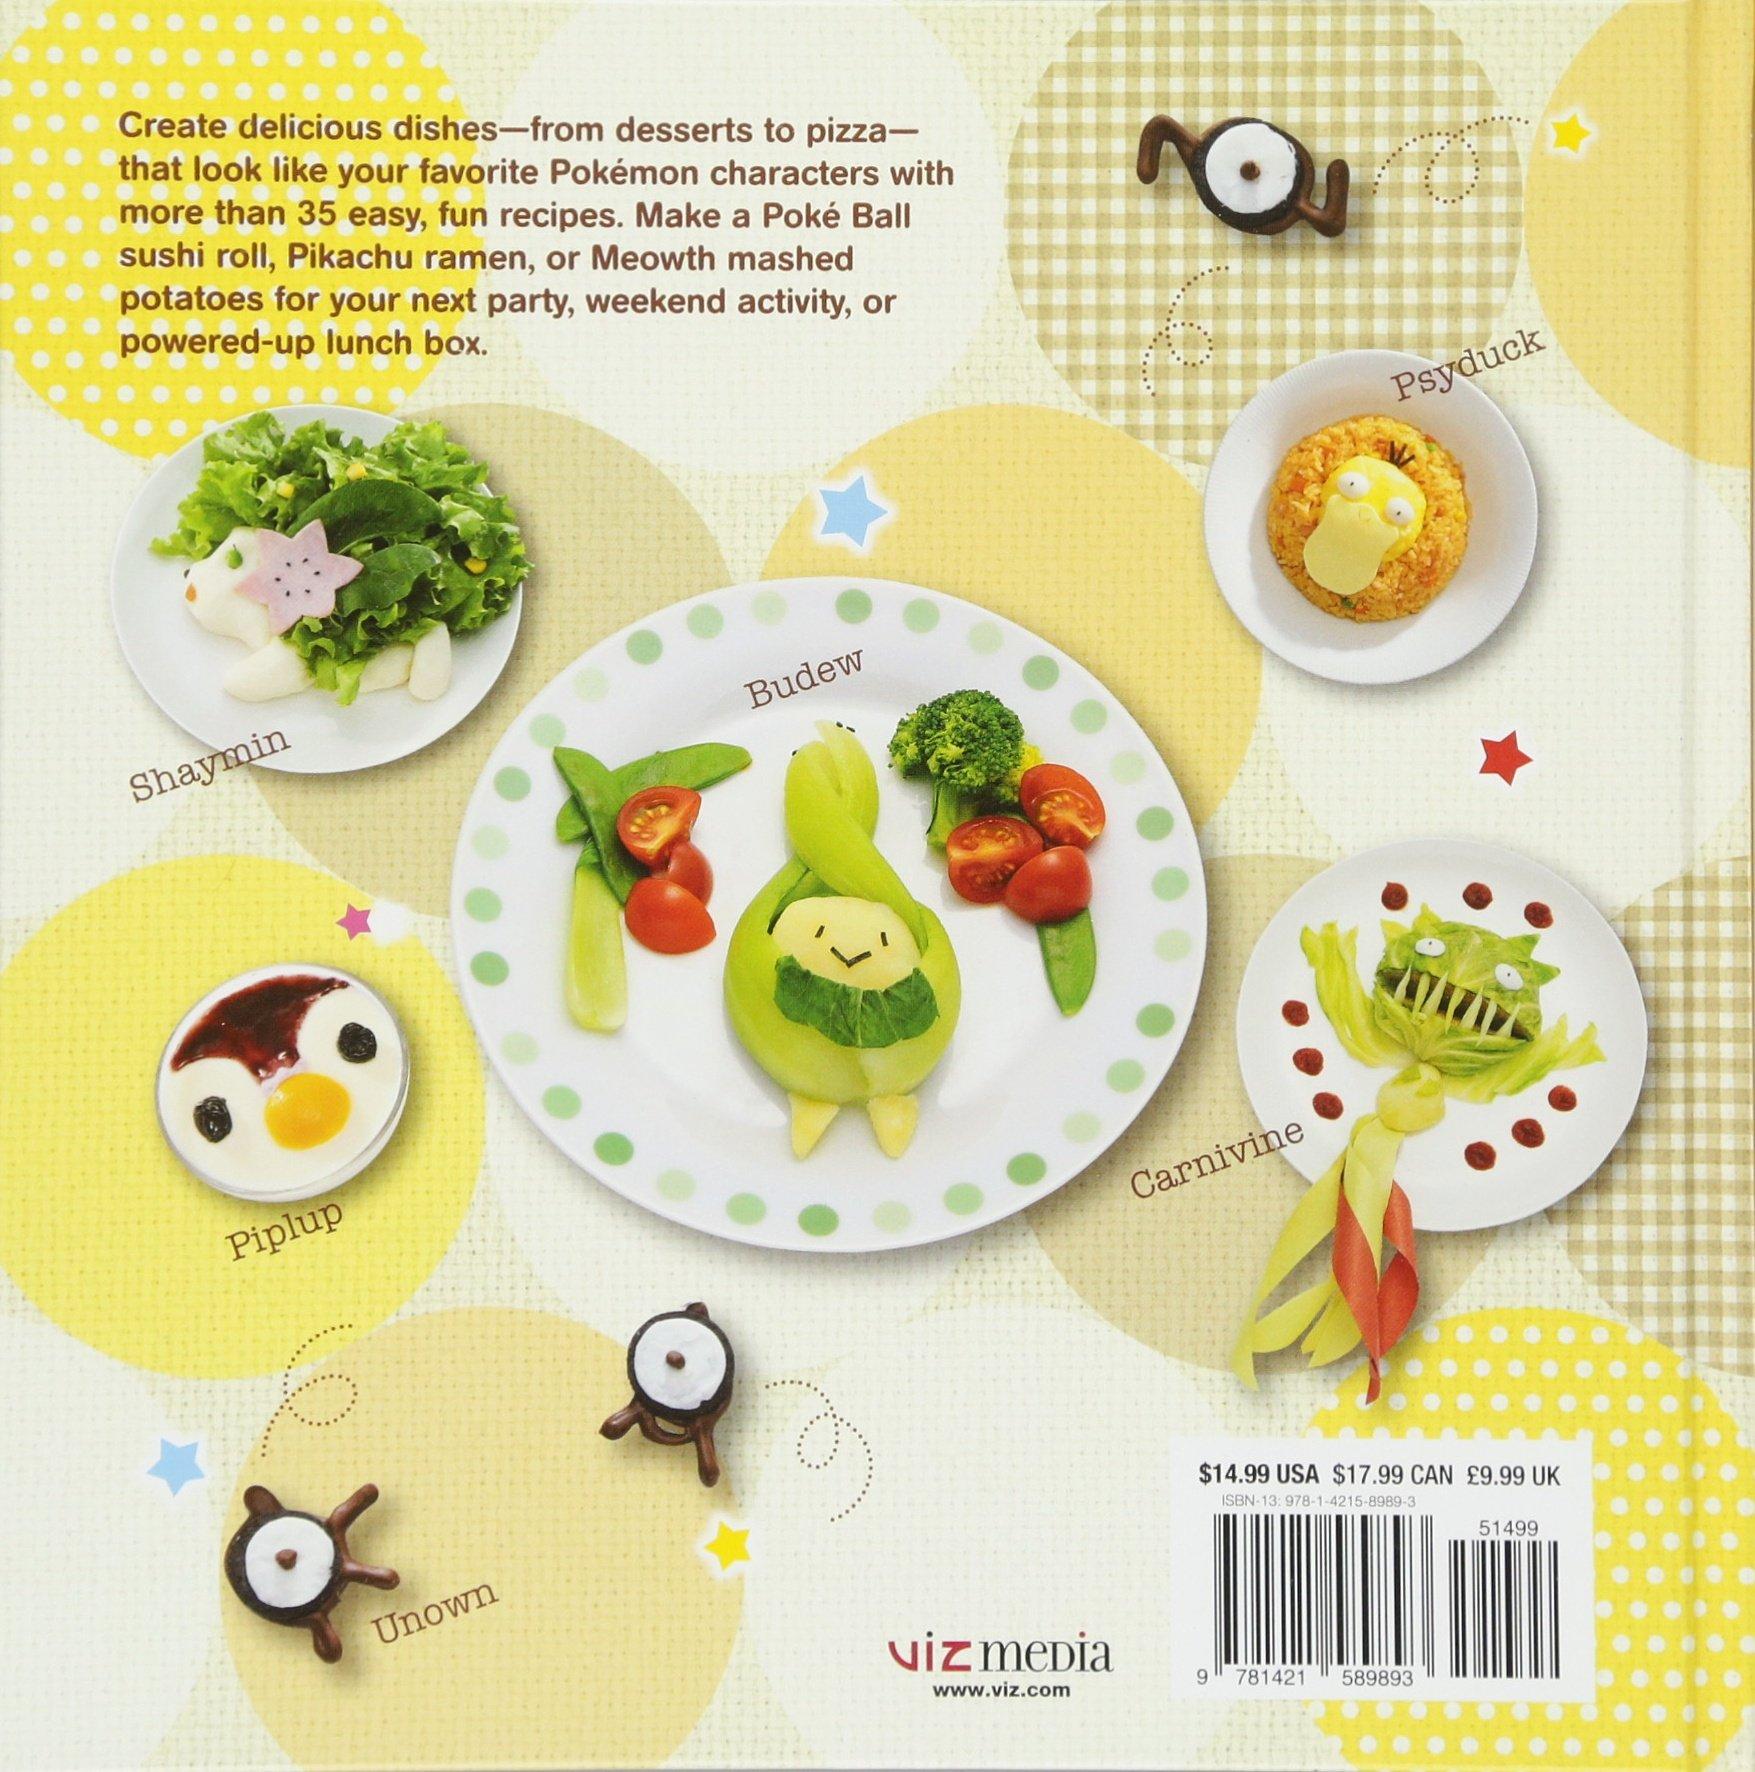 Amazon The Pokemon Cookbook Easy Fun Recipes 9781421589893 Maki Kudo Books